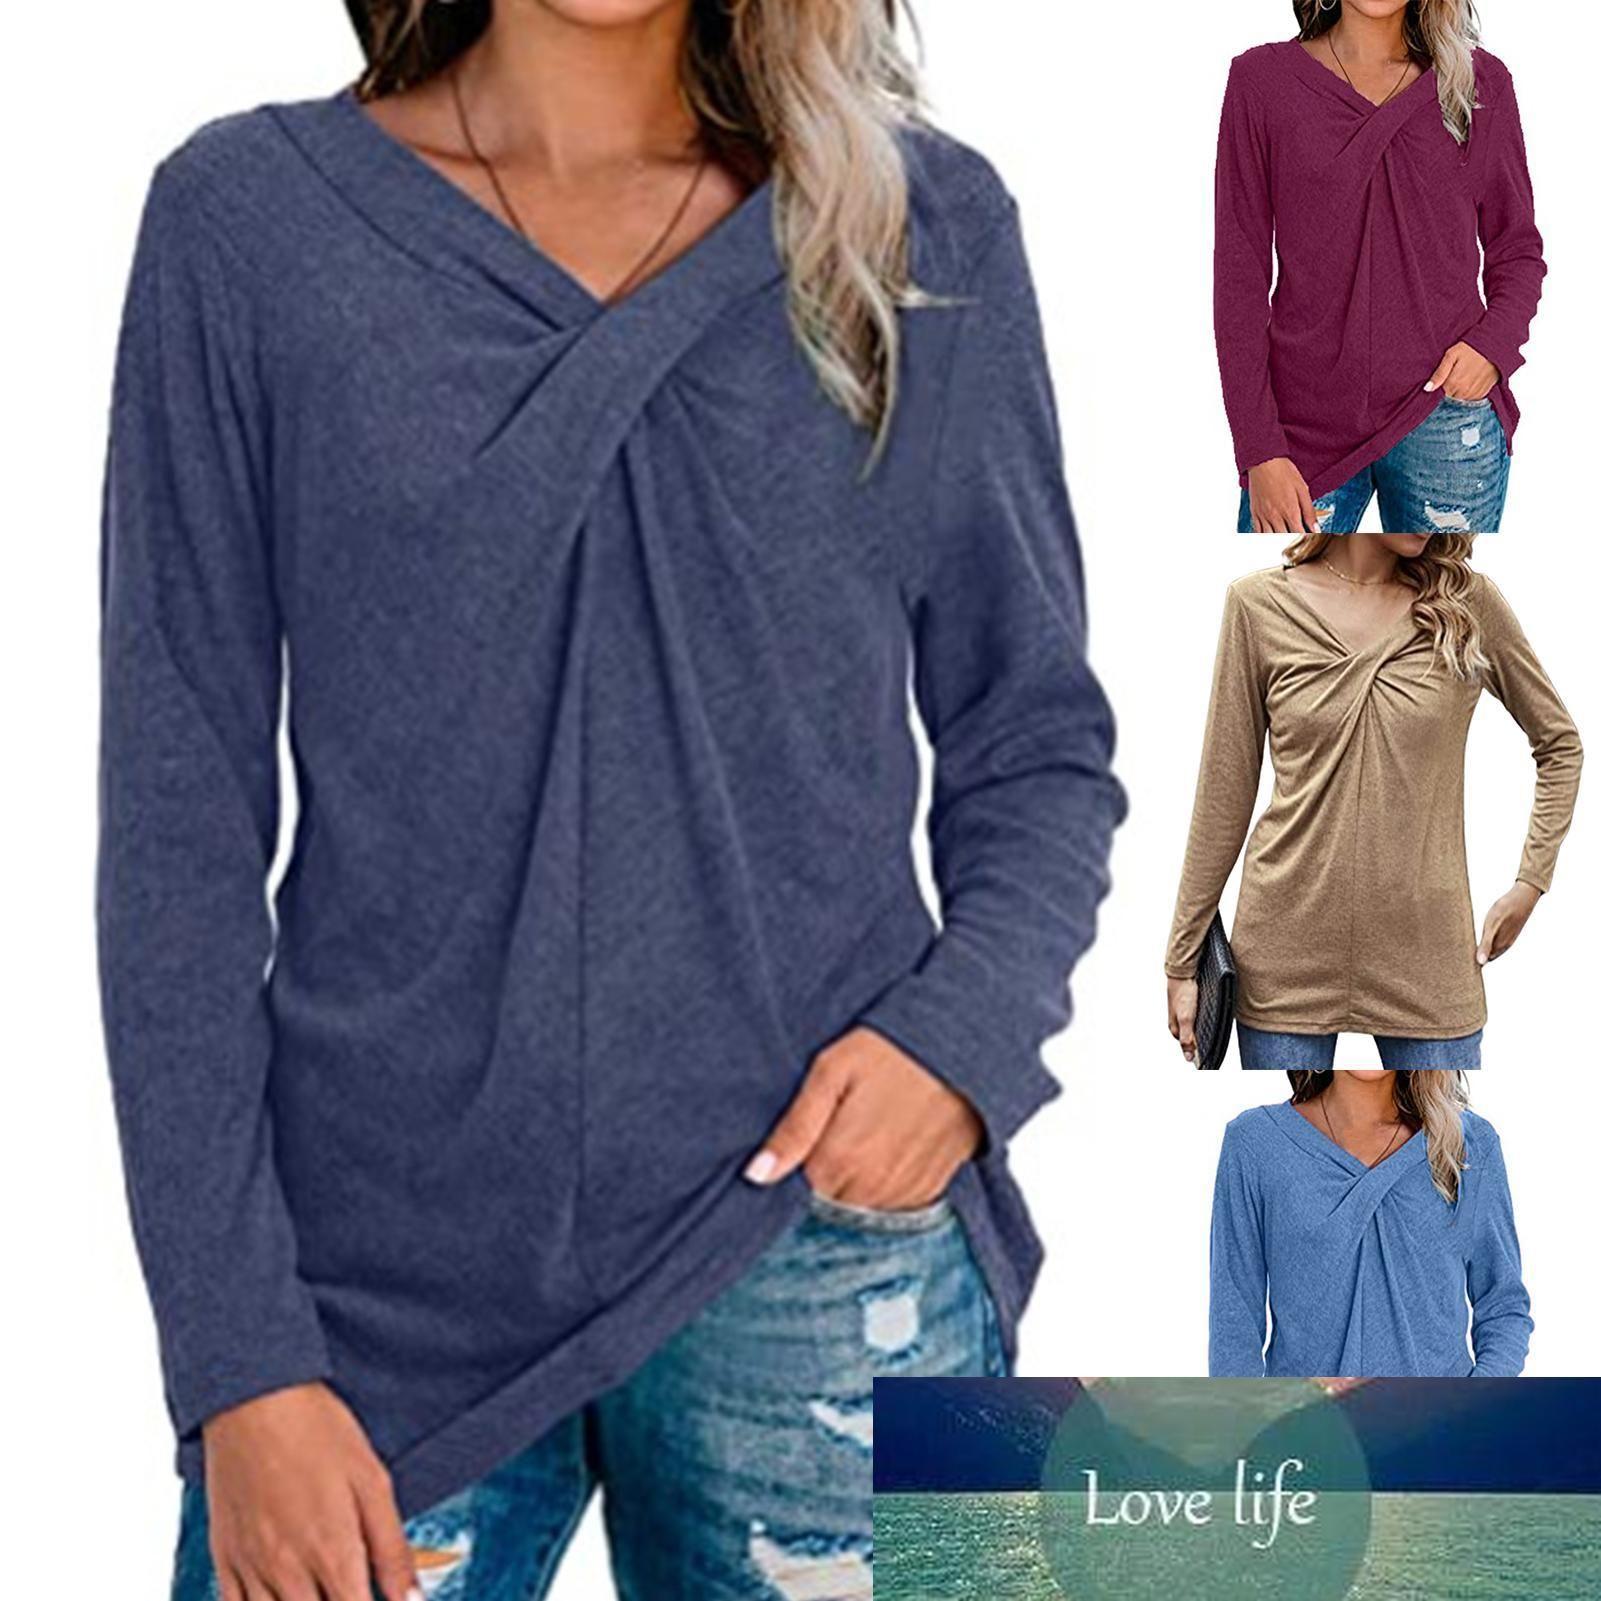 Moda T-Shirt Kadınlar Sonbahar Rahat Pamuk Polyester Sonbahar V Boyun Uzun Kollu Üst Tişört Göğüs Çapraz Knot Tee Kazak